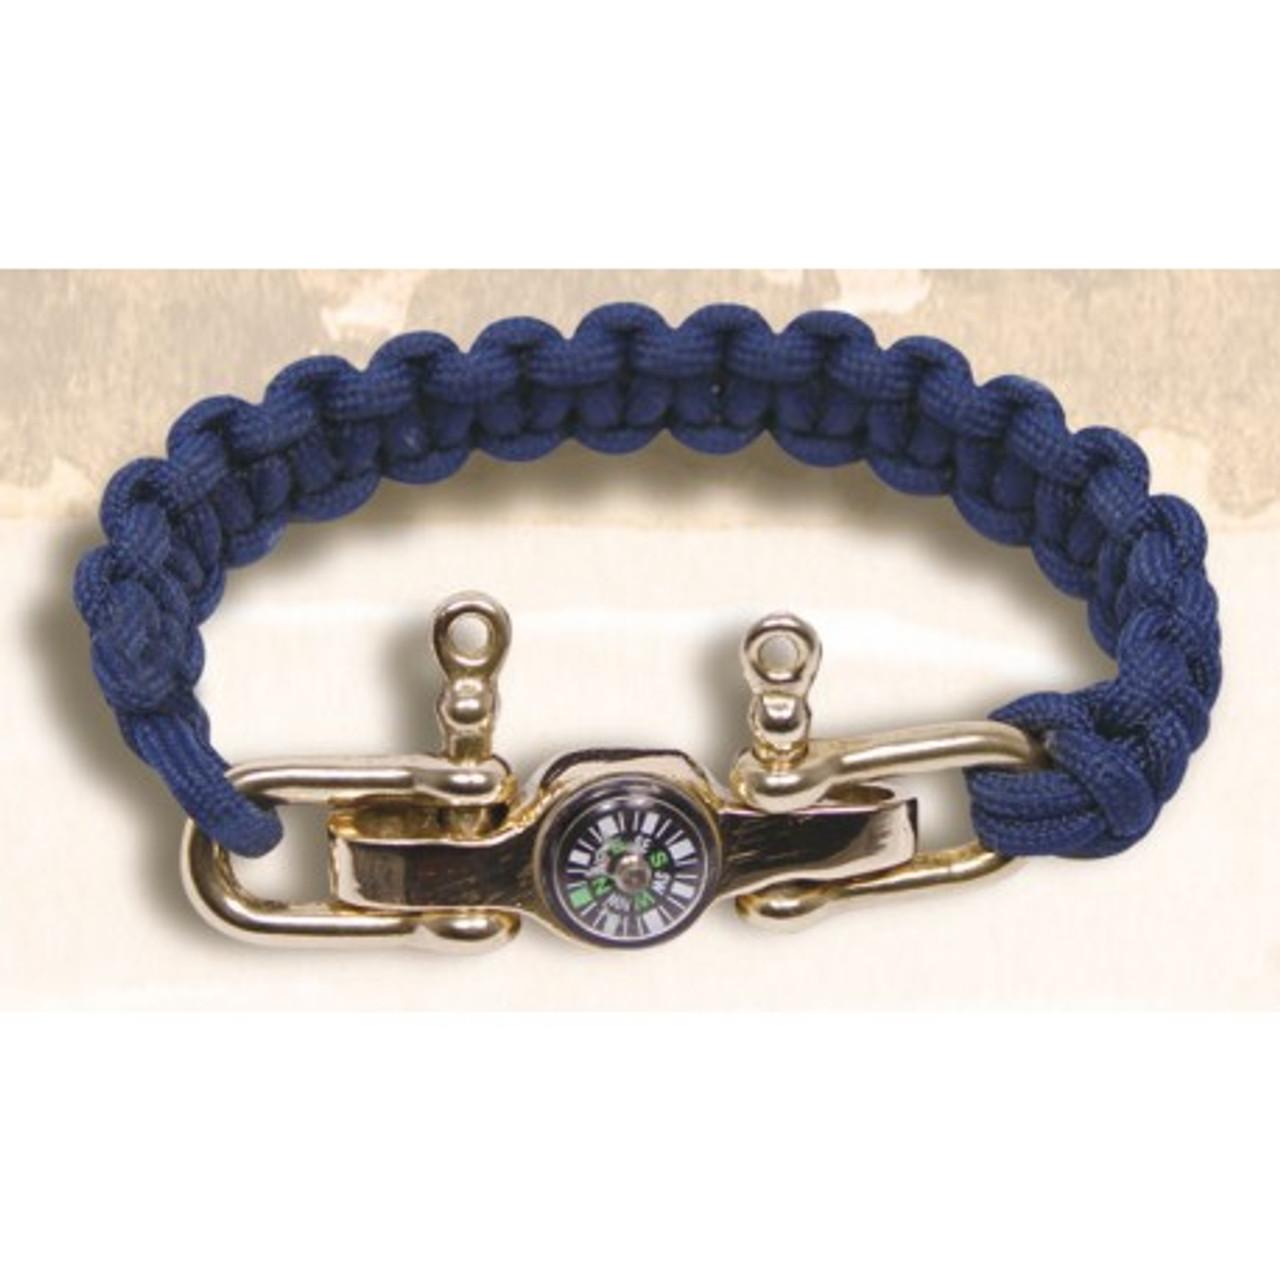 Navy Lanyard Bracelet with Brass Compass